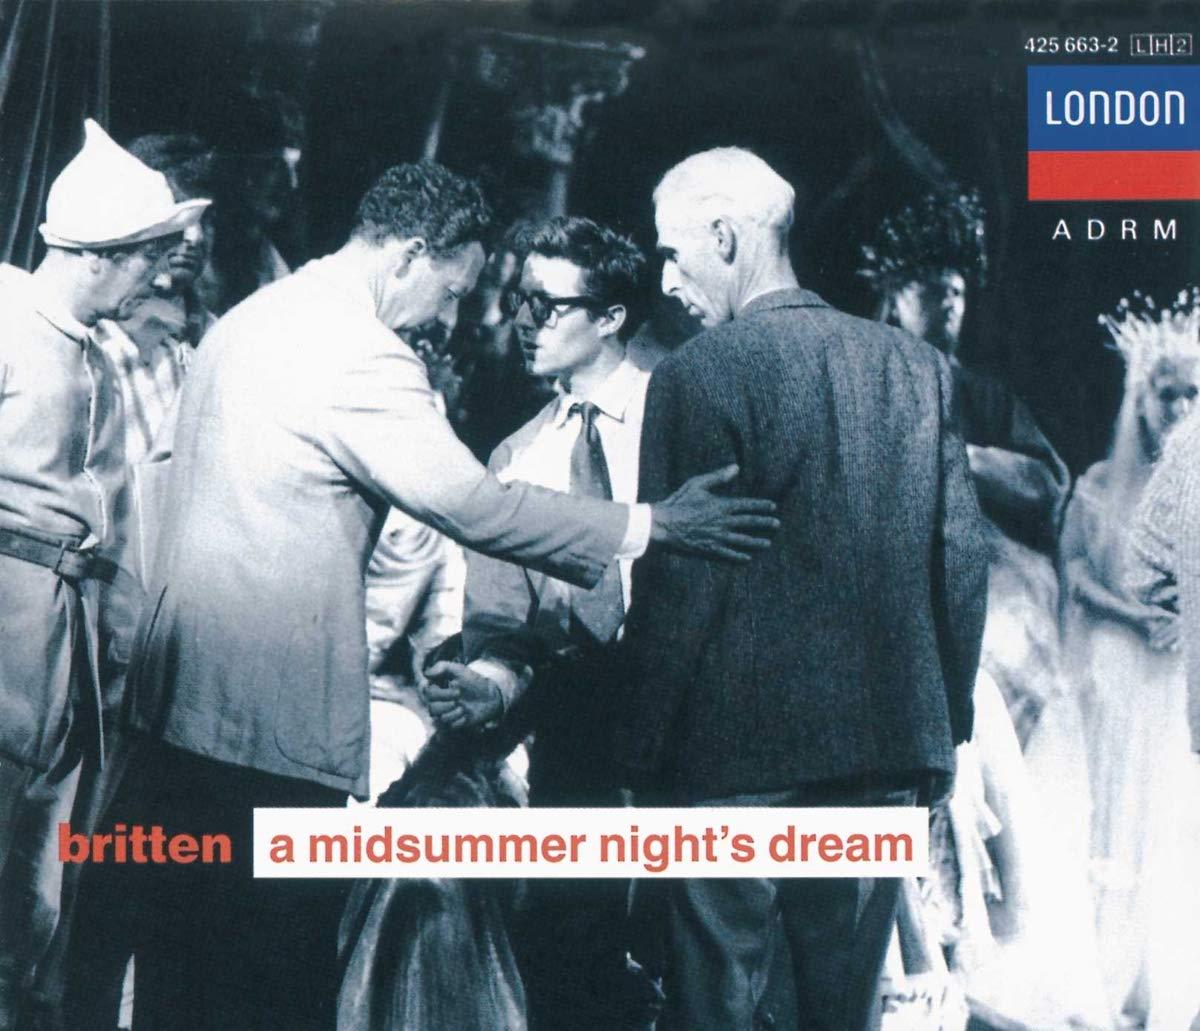 Quality inspection Britten: wholesale A Midsummer Night's Dream